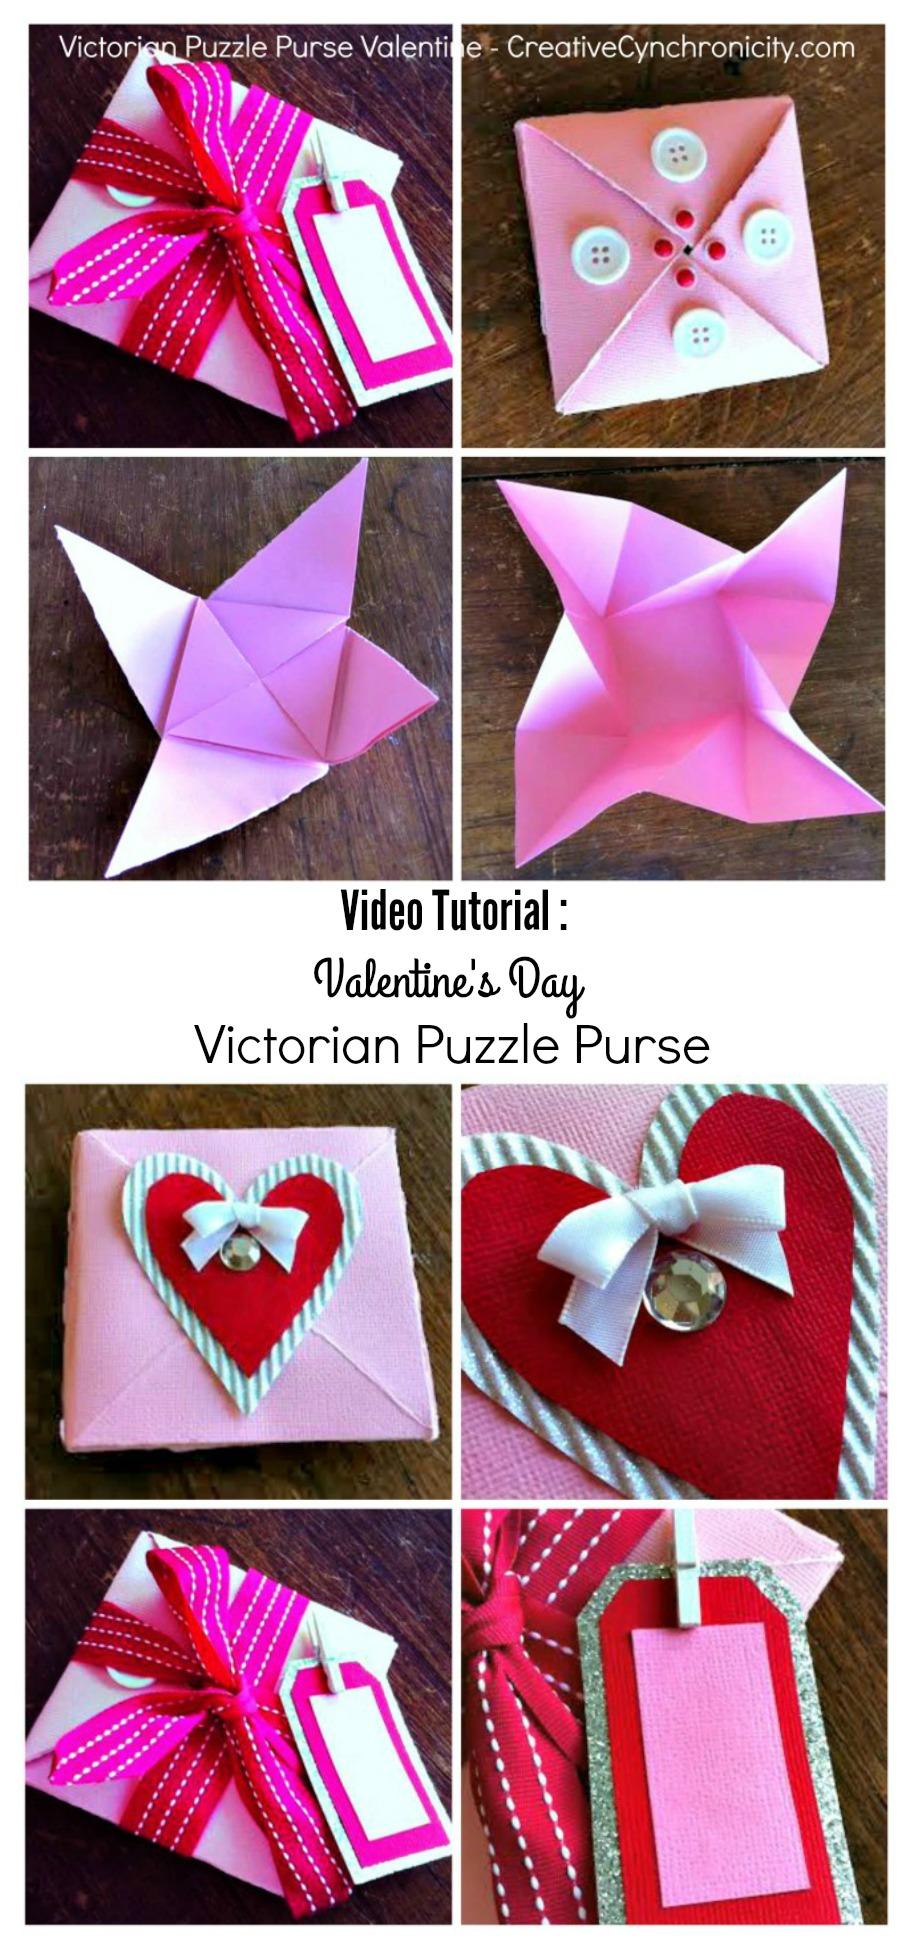 Valentine's Day Victorian Puzzle Purse